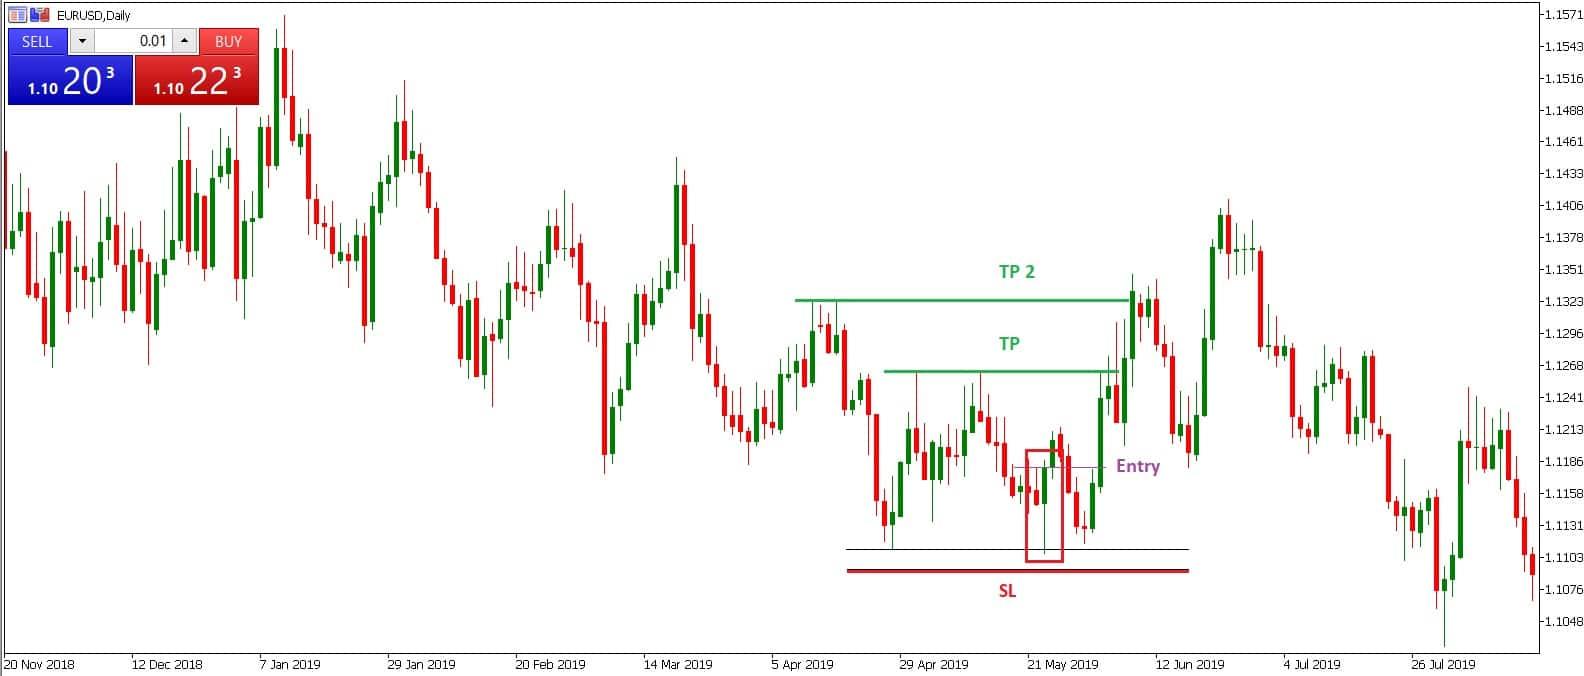 bullish engulfing pattern trading